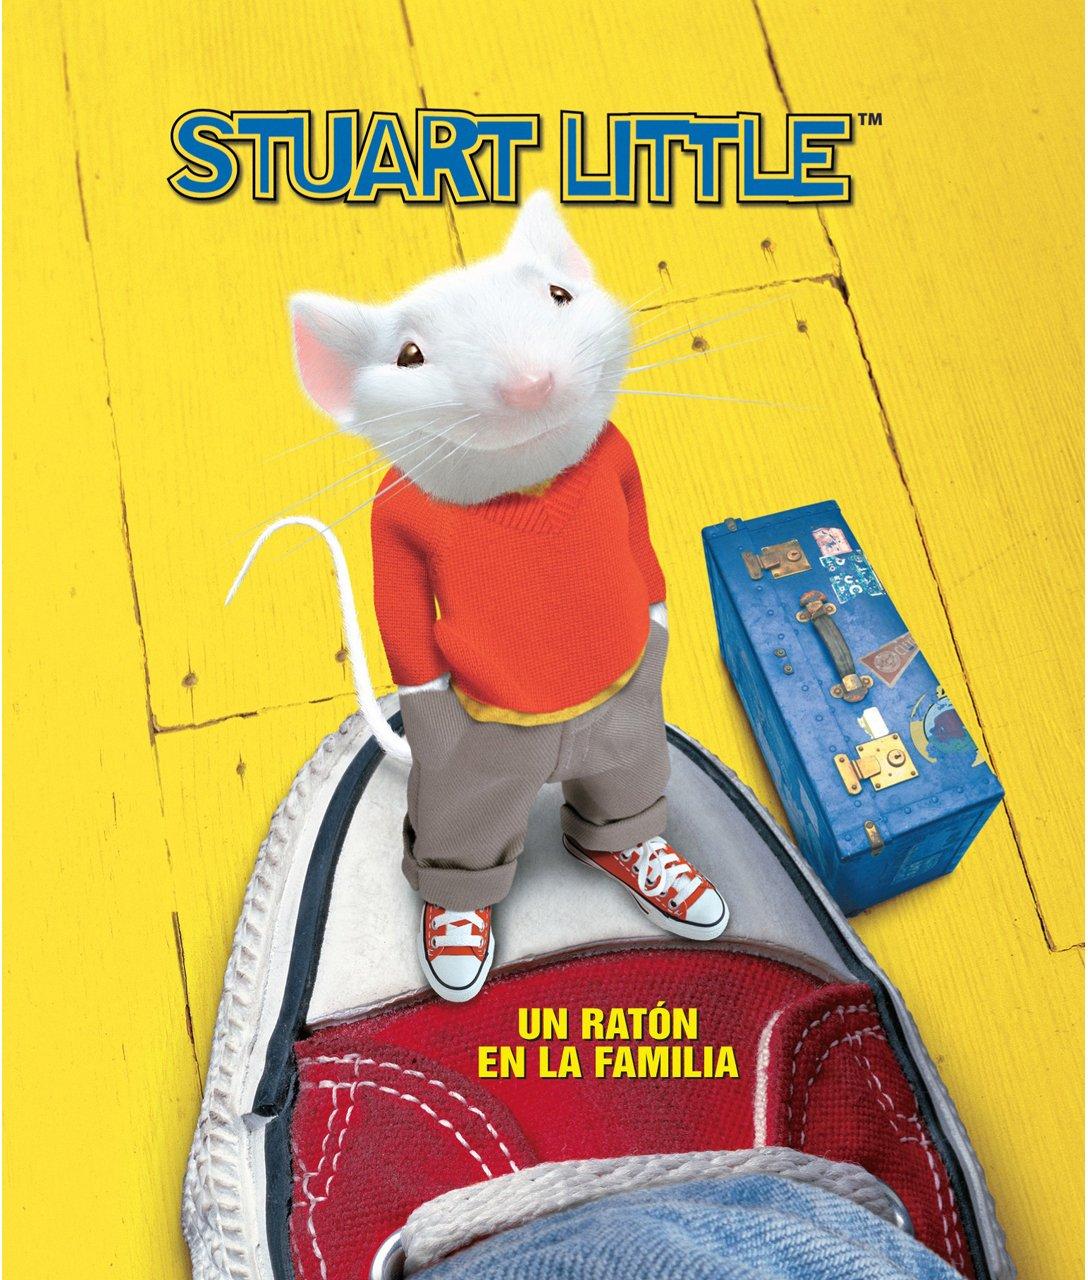 Amazon.com: Stuart Little (Blu-Ray) (Import Movie) (European Format - Zone B2) (2011) Geena Davis; Hugh Laurie; Jonathan L: Movies & TV